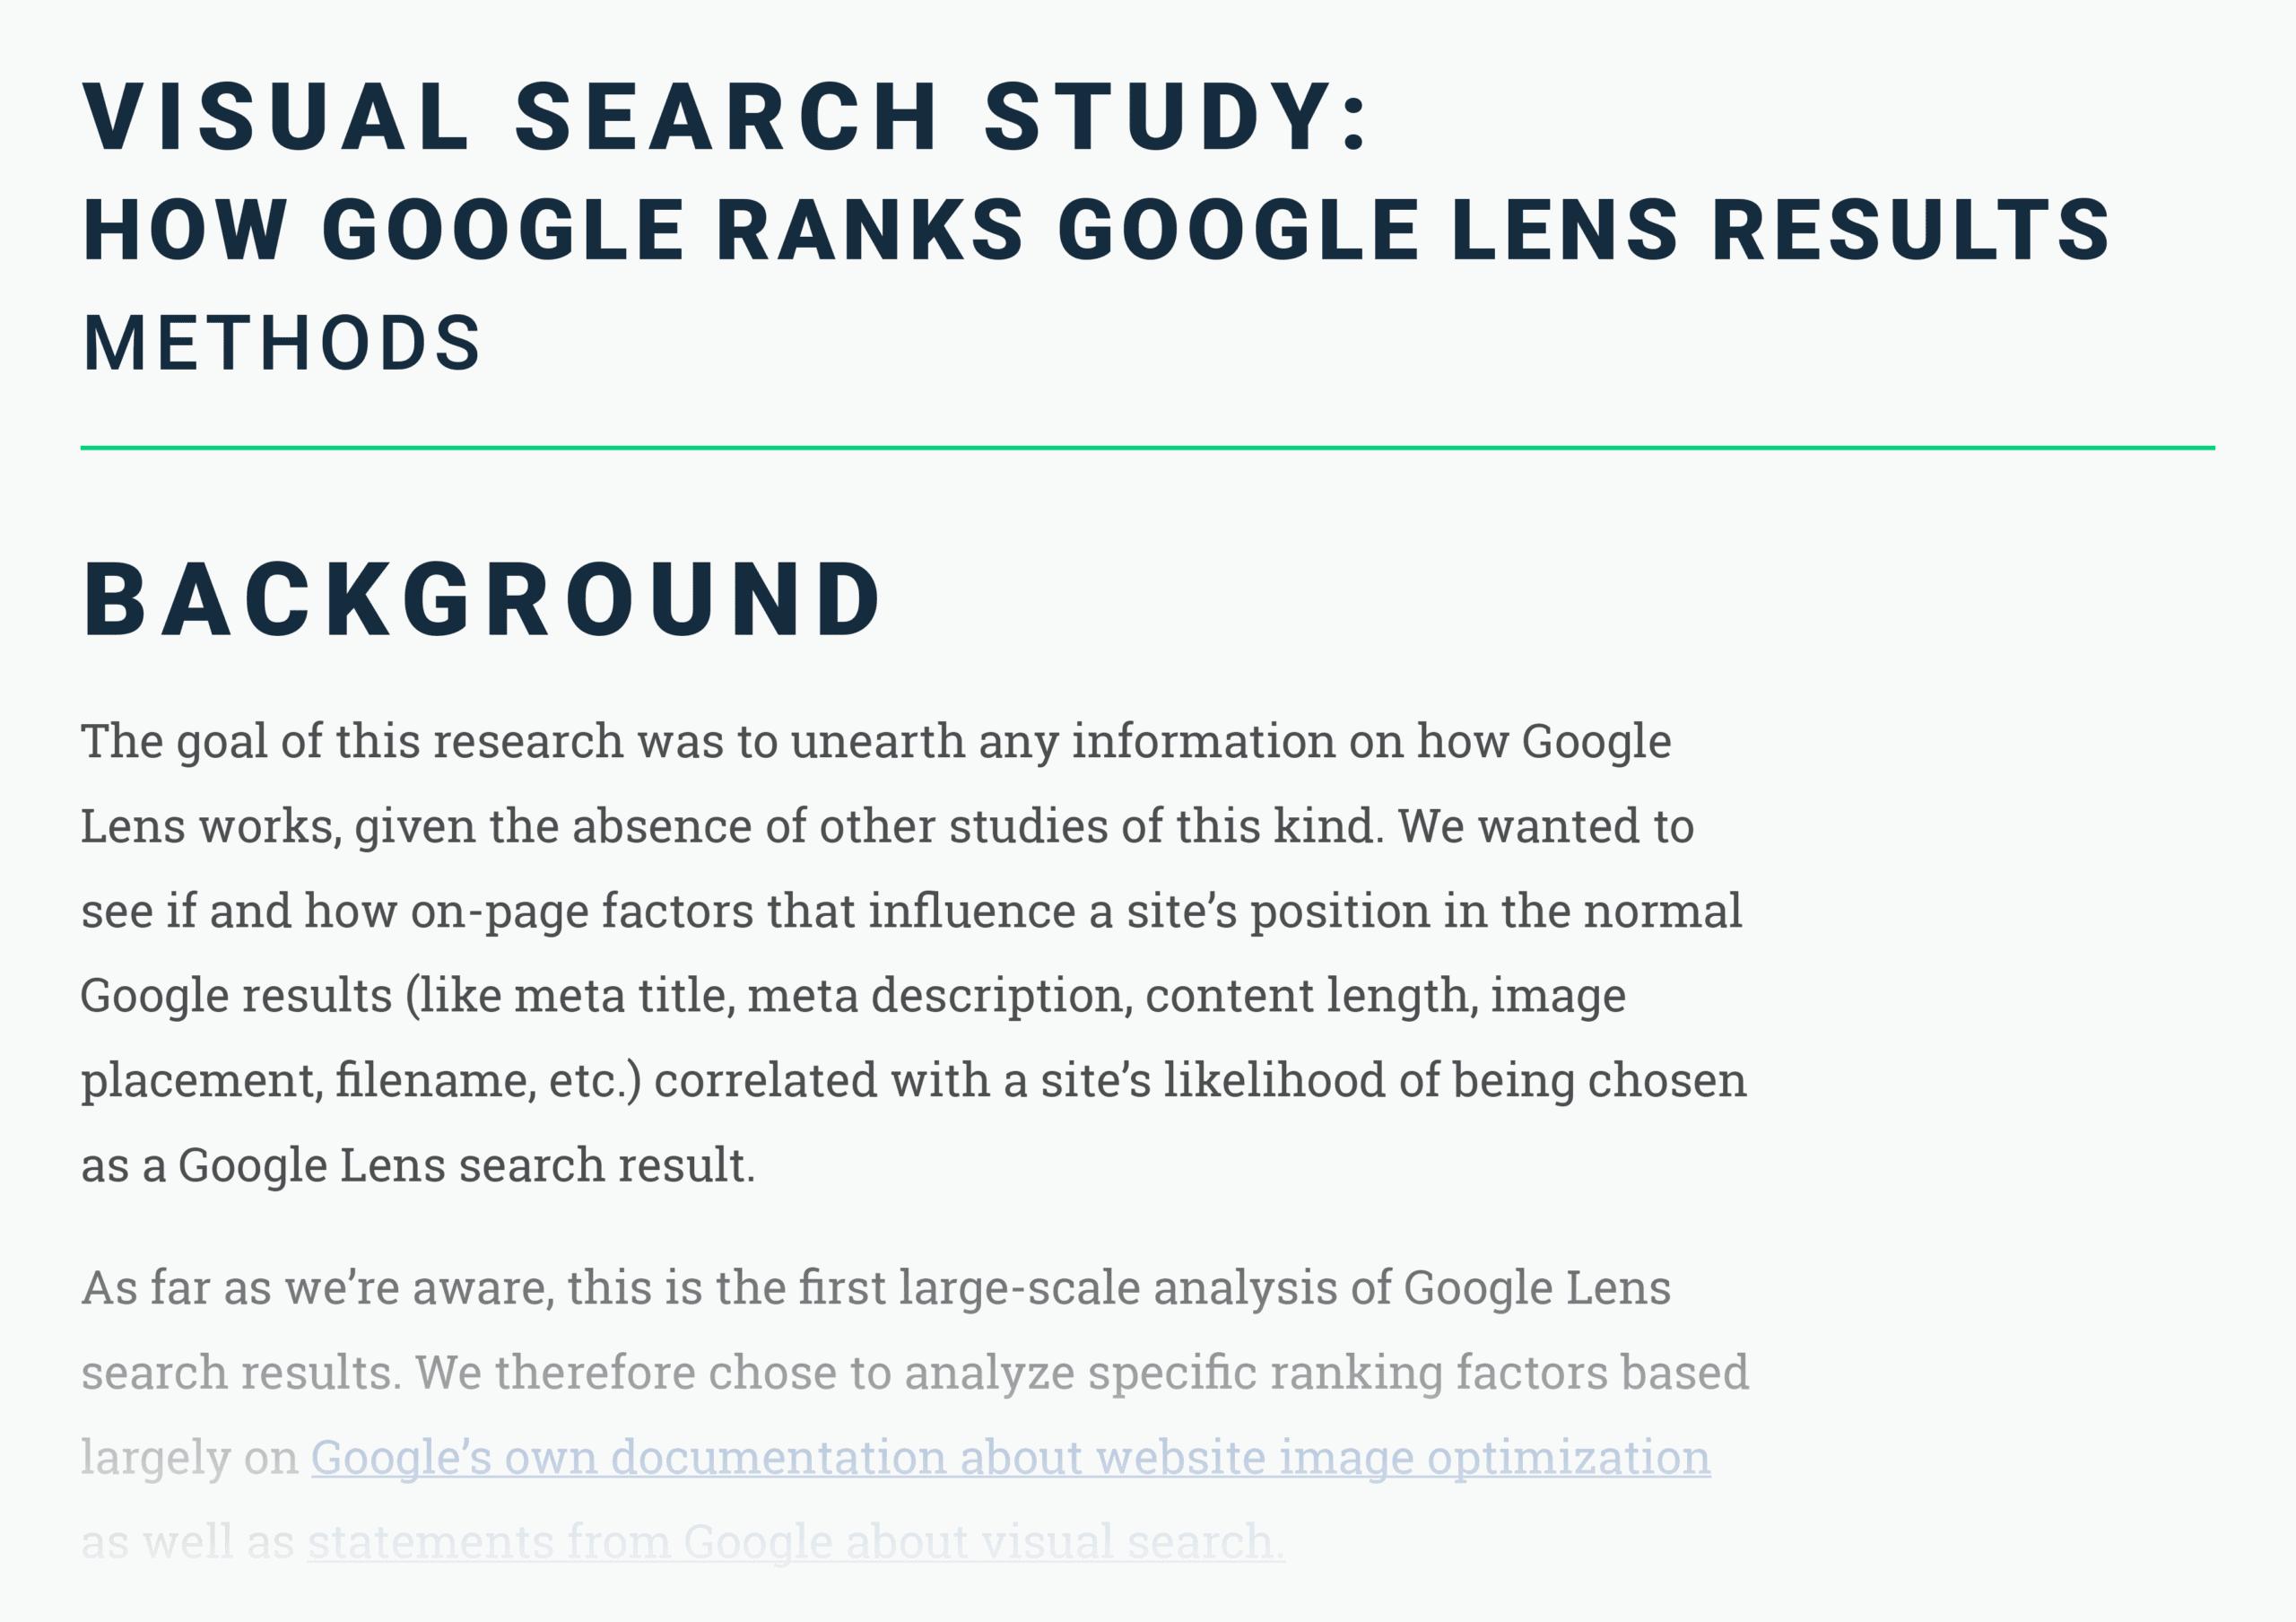 Visual search ranking factors methods